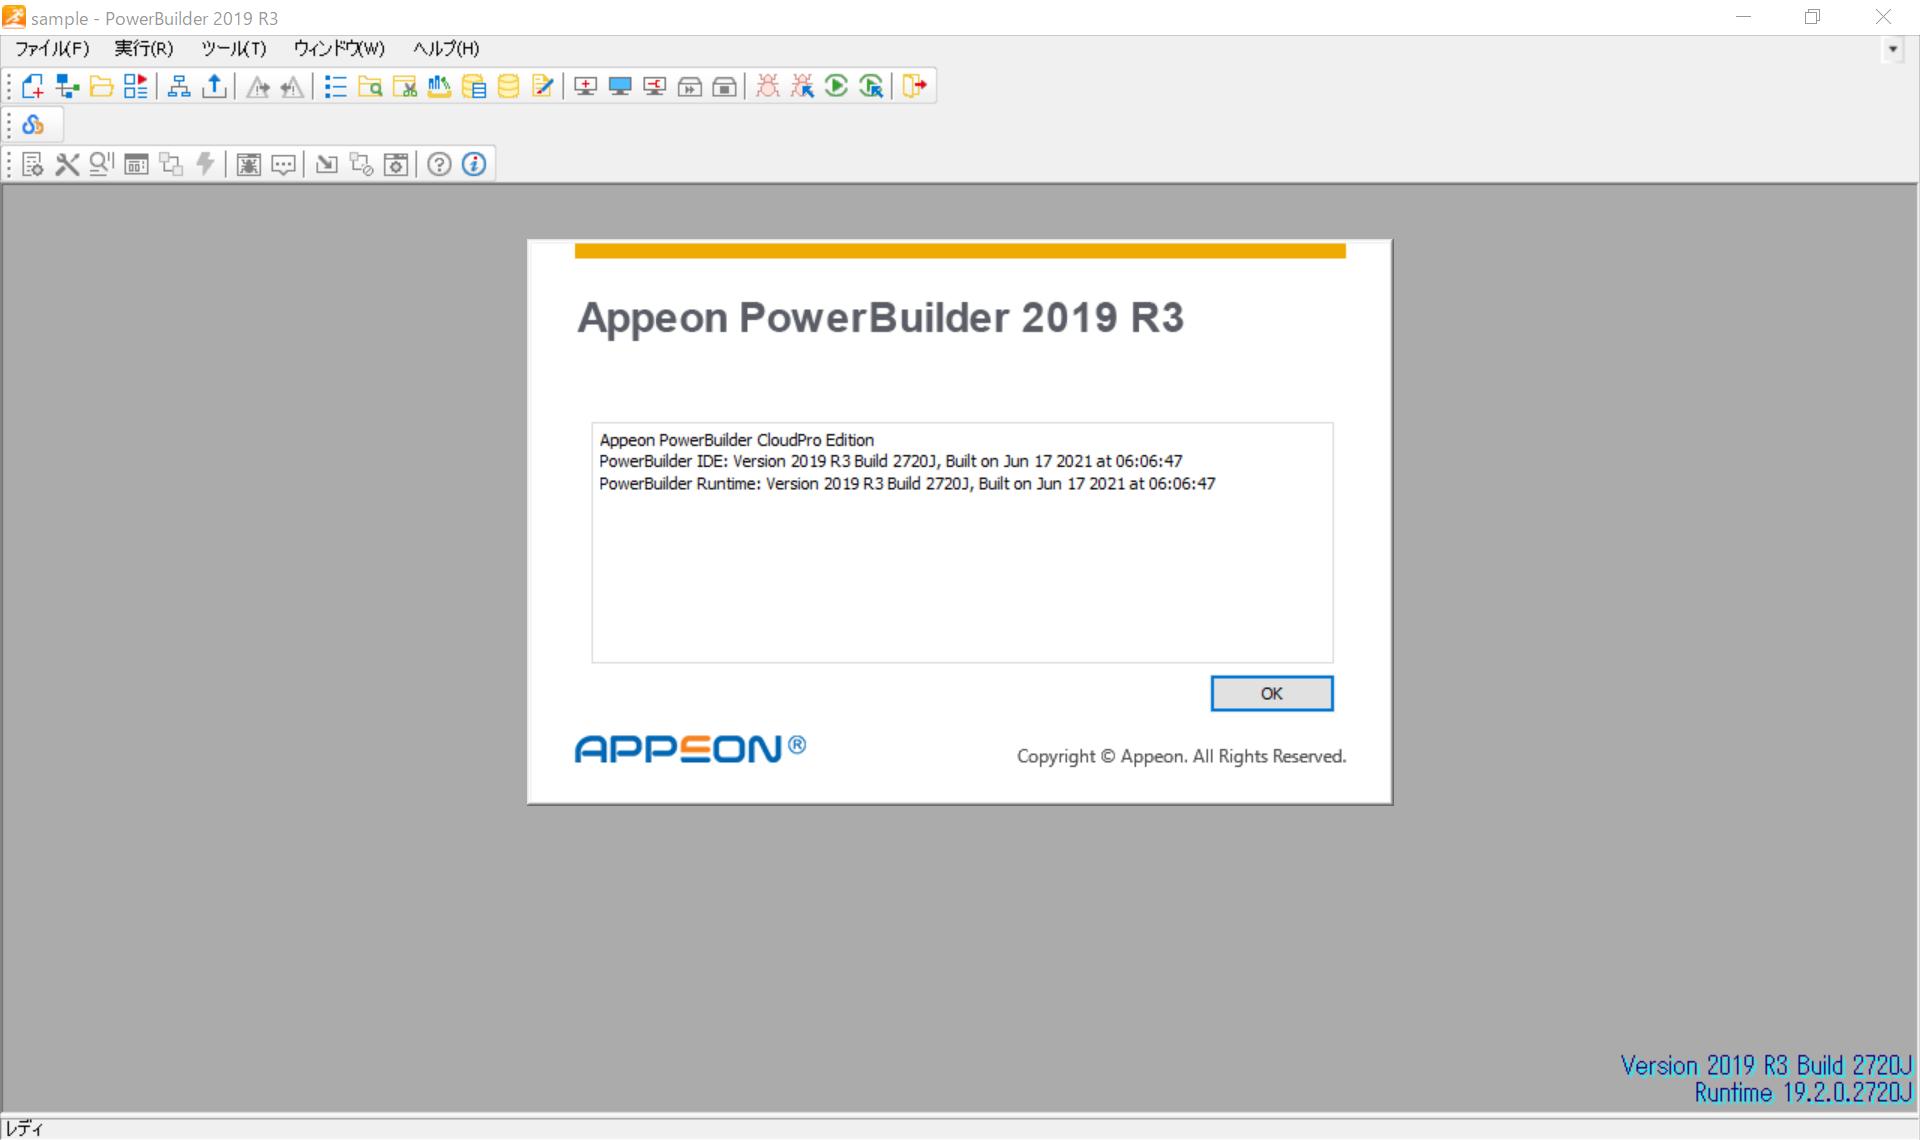 PowerBuilder 2019 R3 IDE (About)